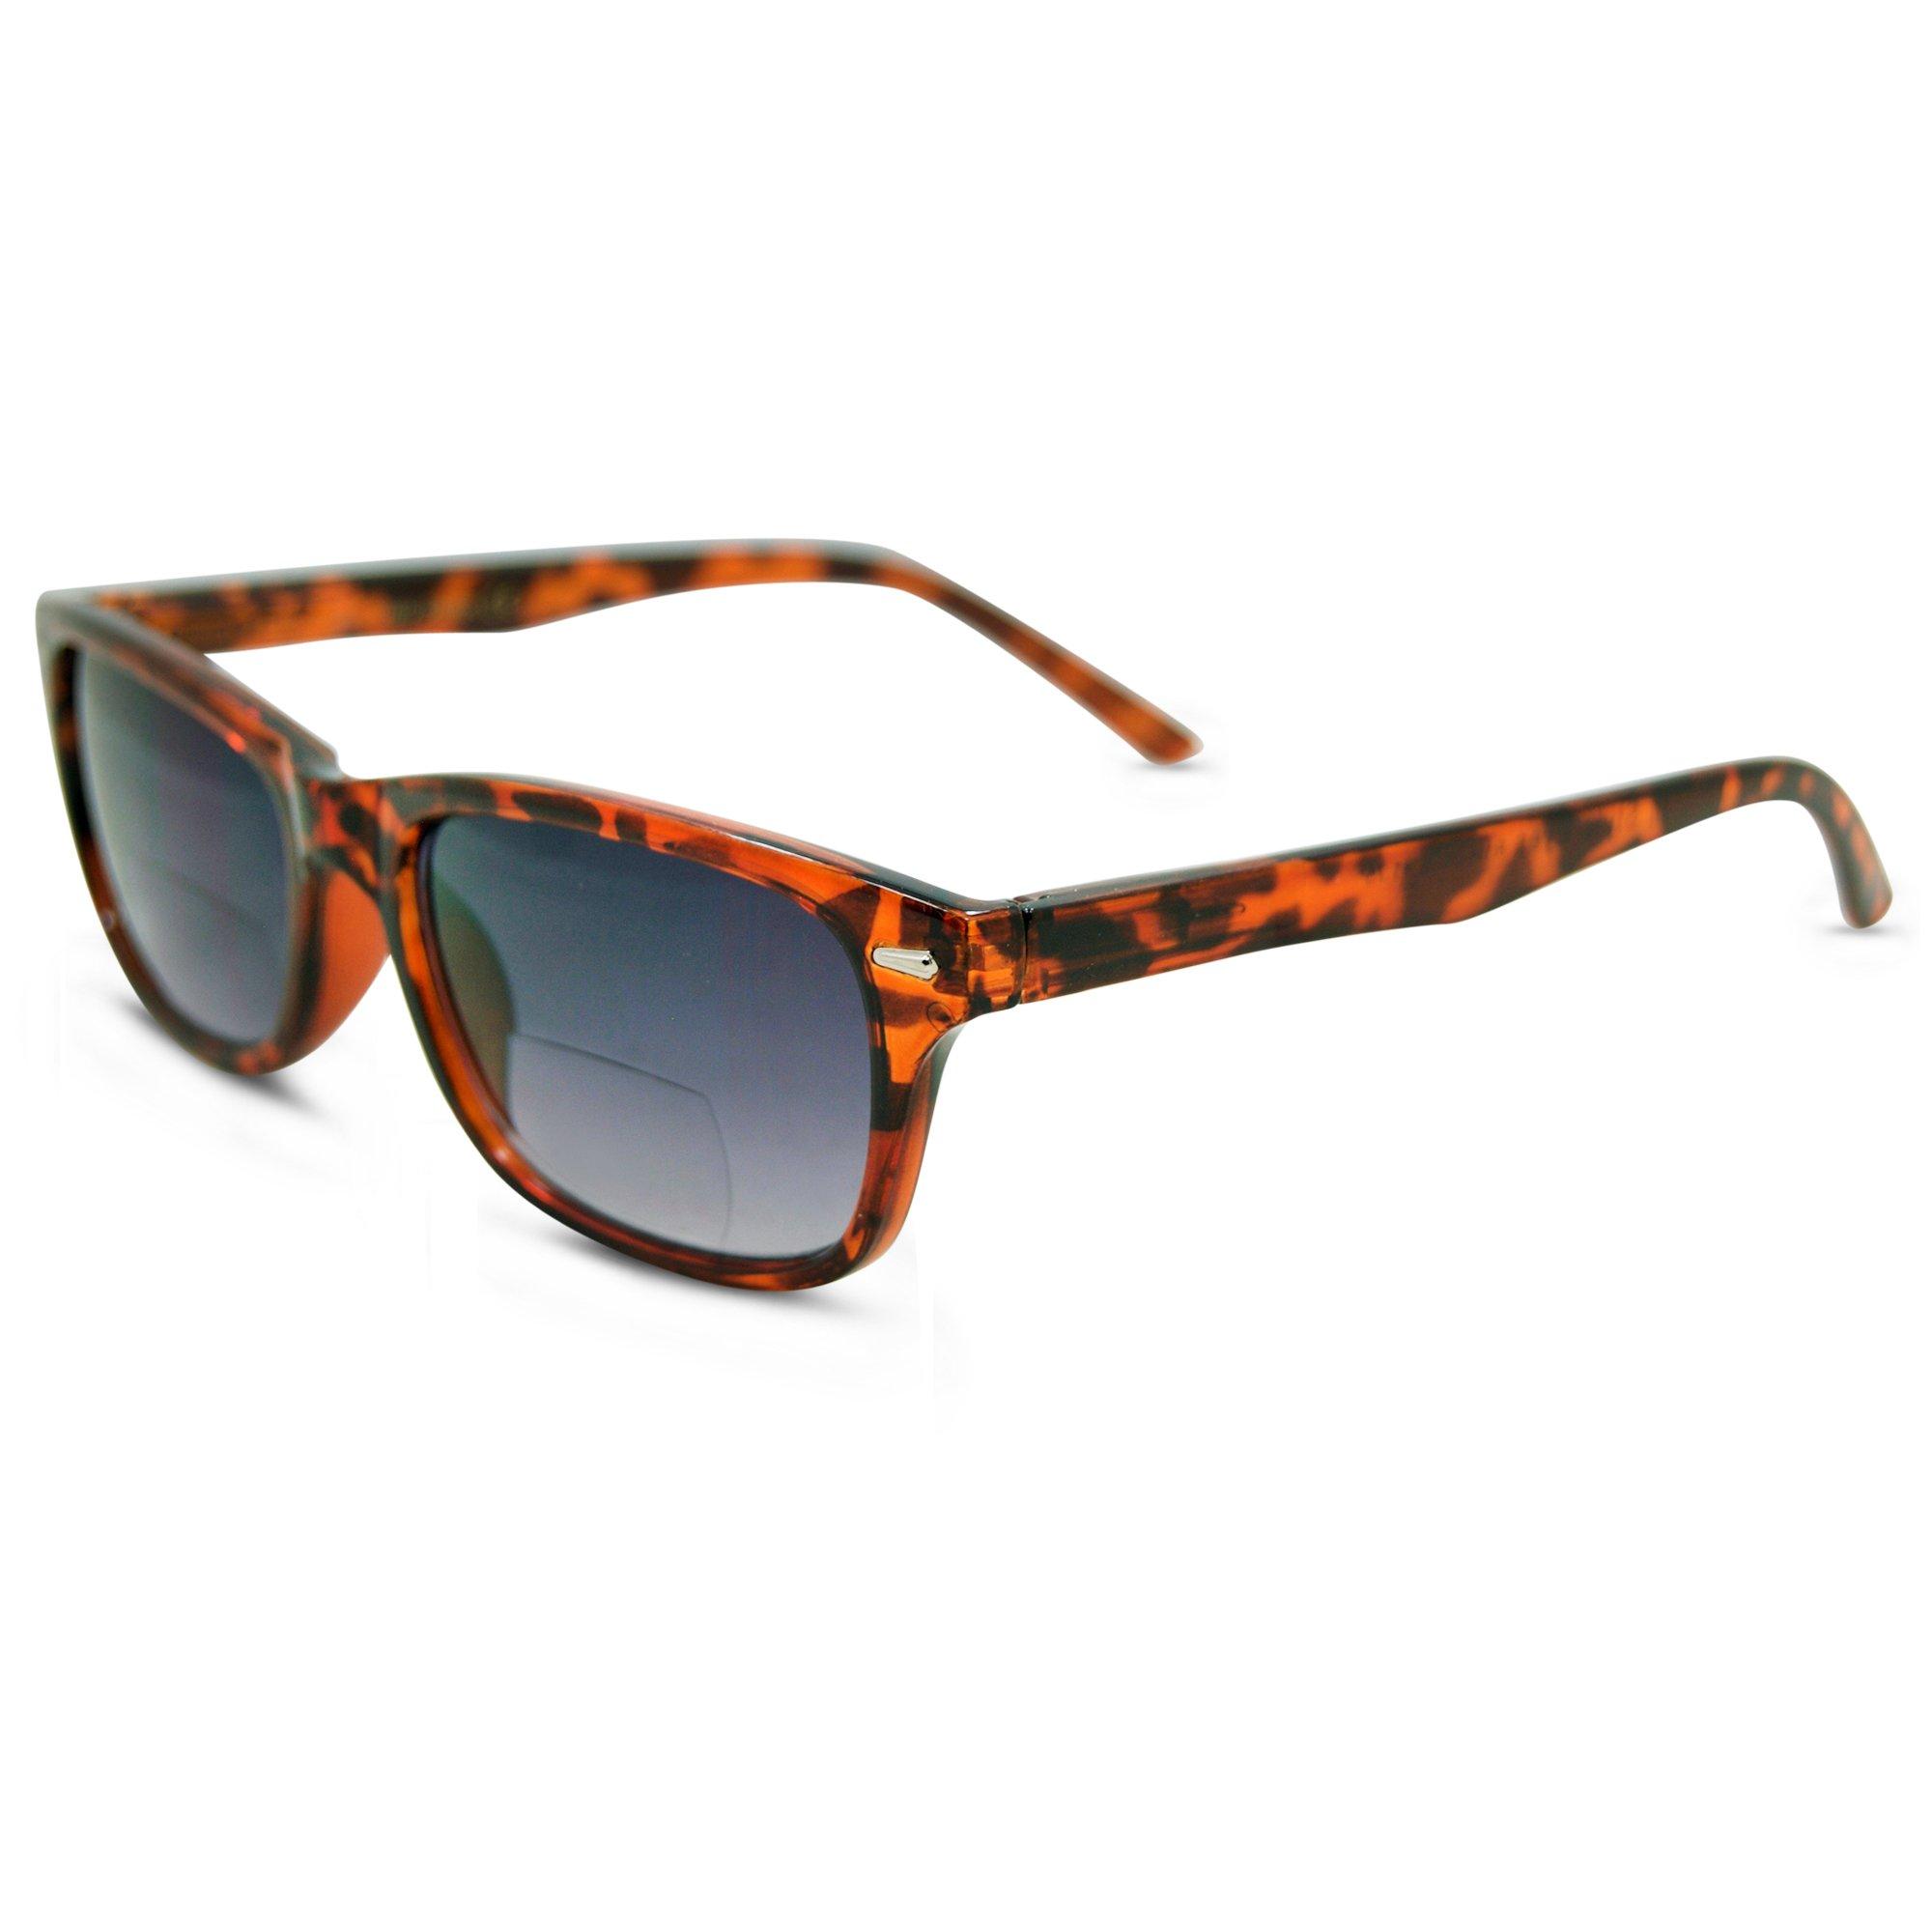 In Style Eyes Seymore Wayfarer BiFocal Sunglasses for Both Men & Women Tortoise 2.50